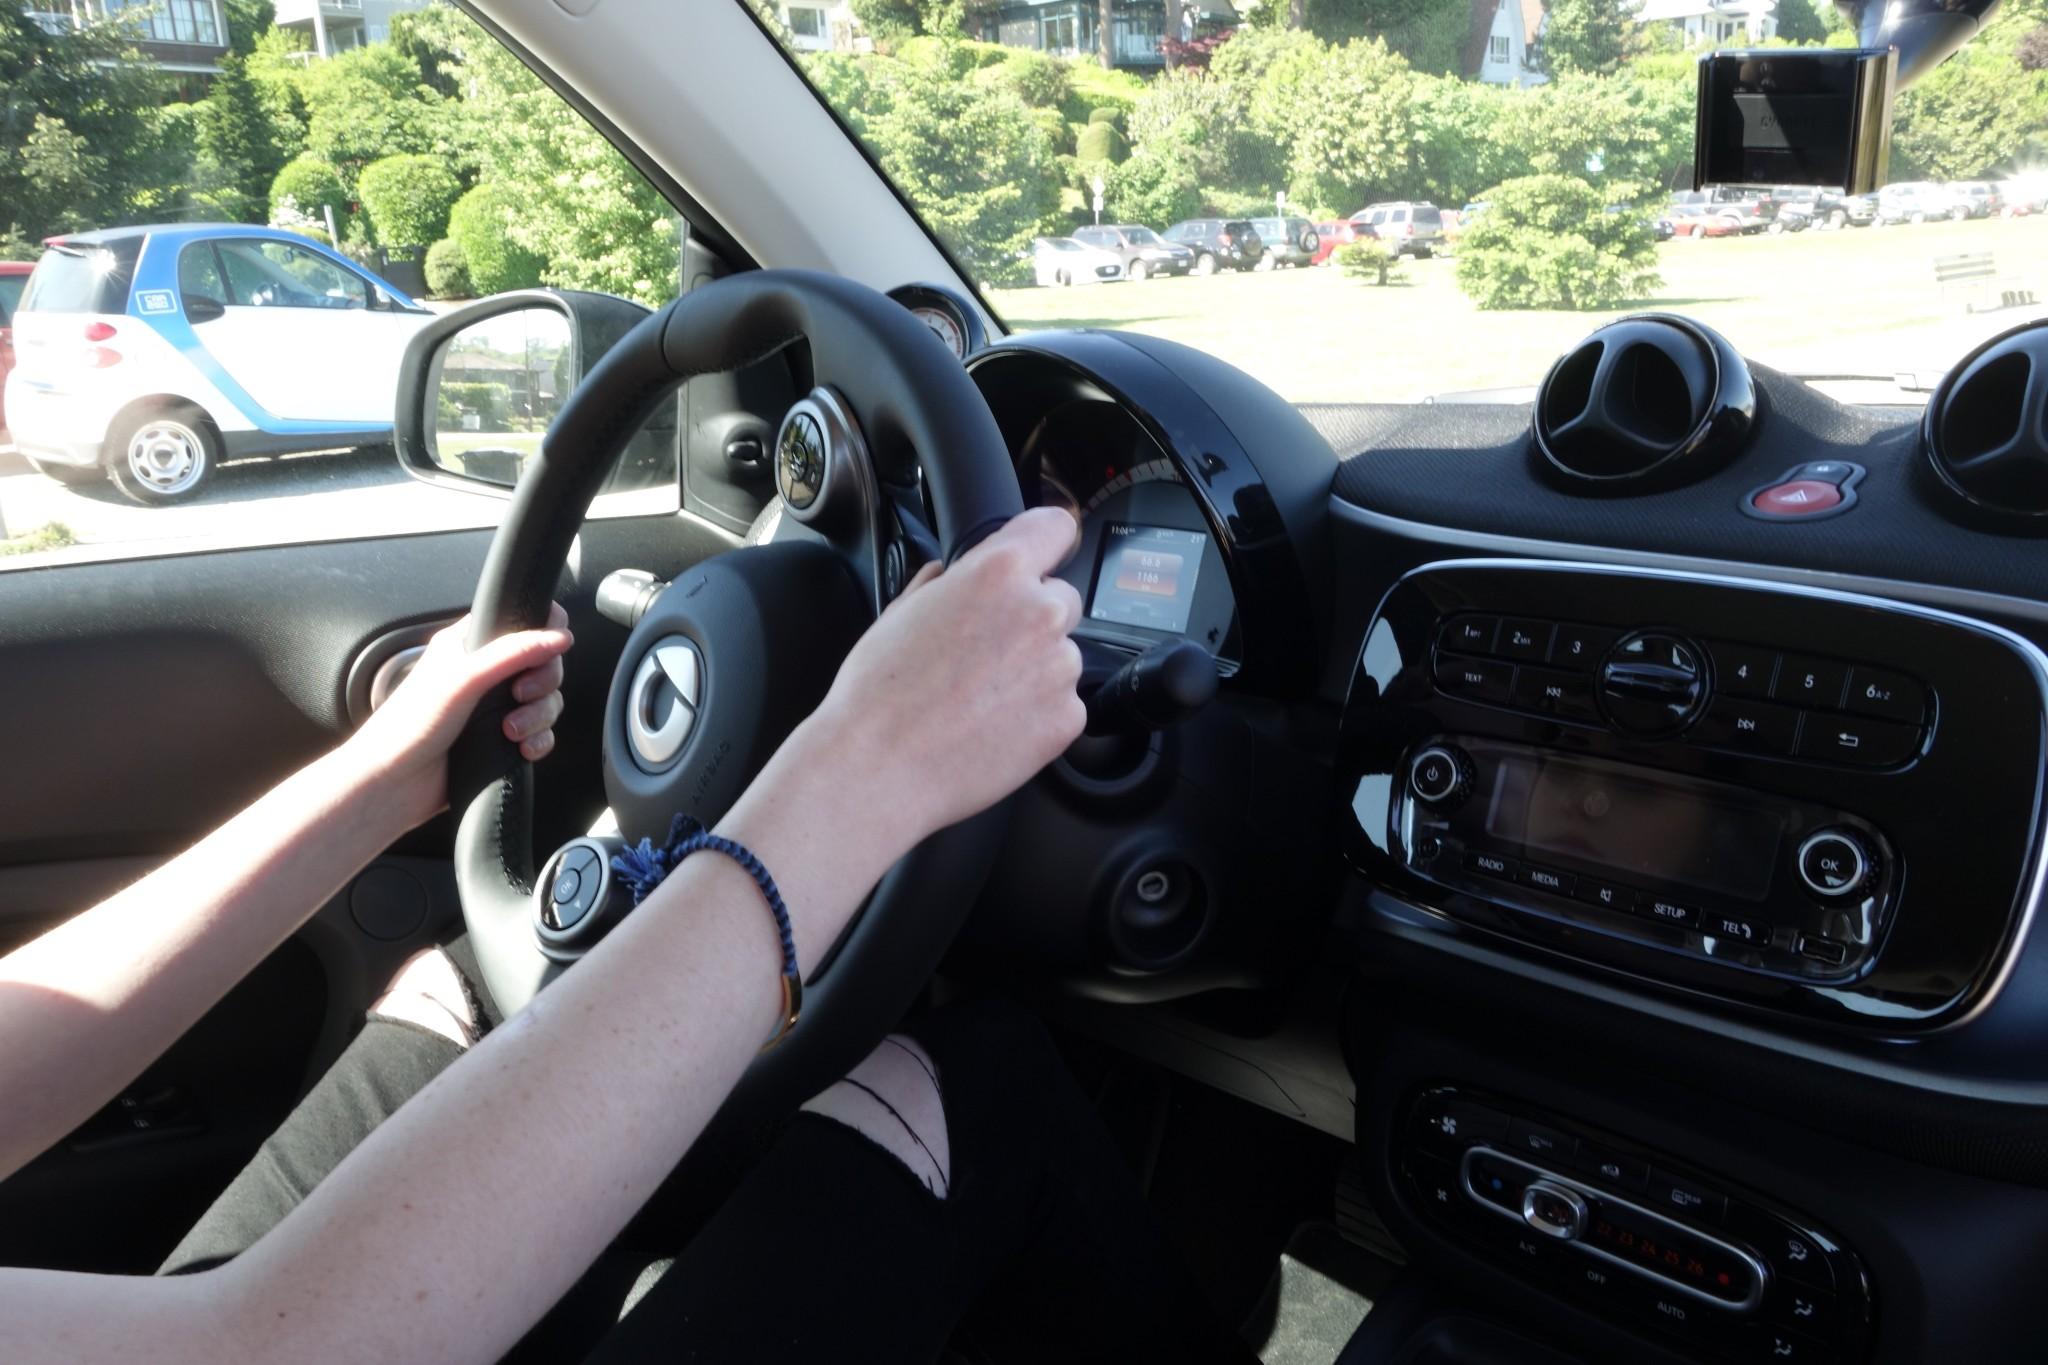 Mercedes 2016 Smart Fortwo / Sebastiaan Chia